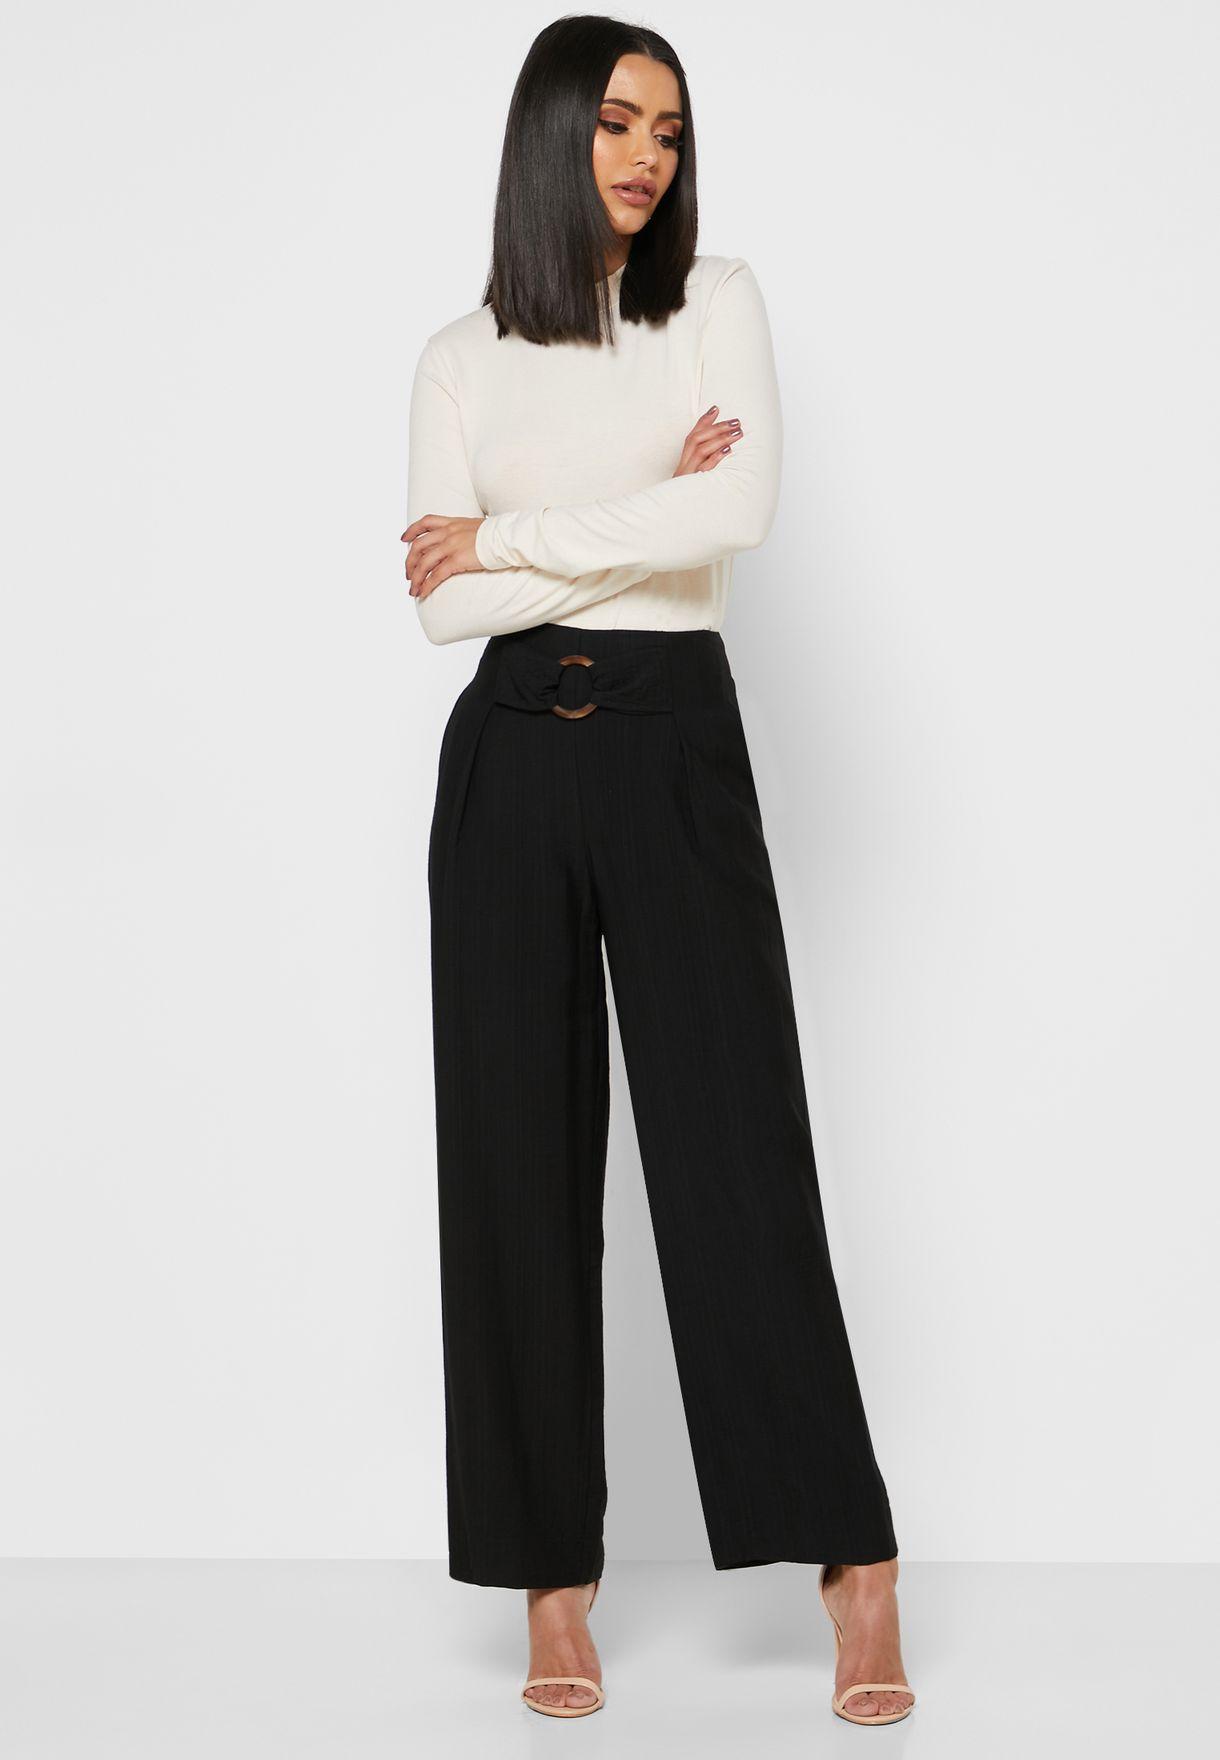 Buckle Waist Detailed Pants